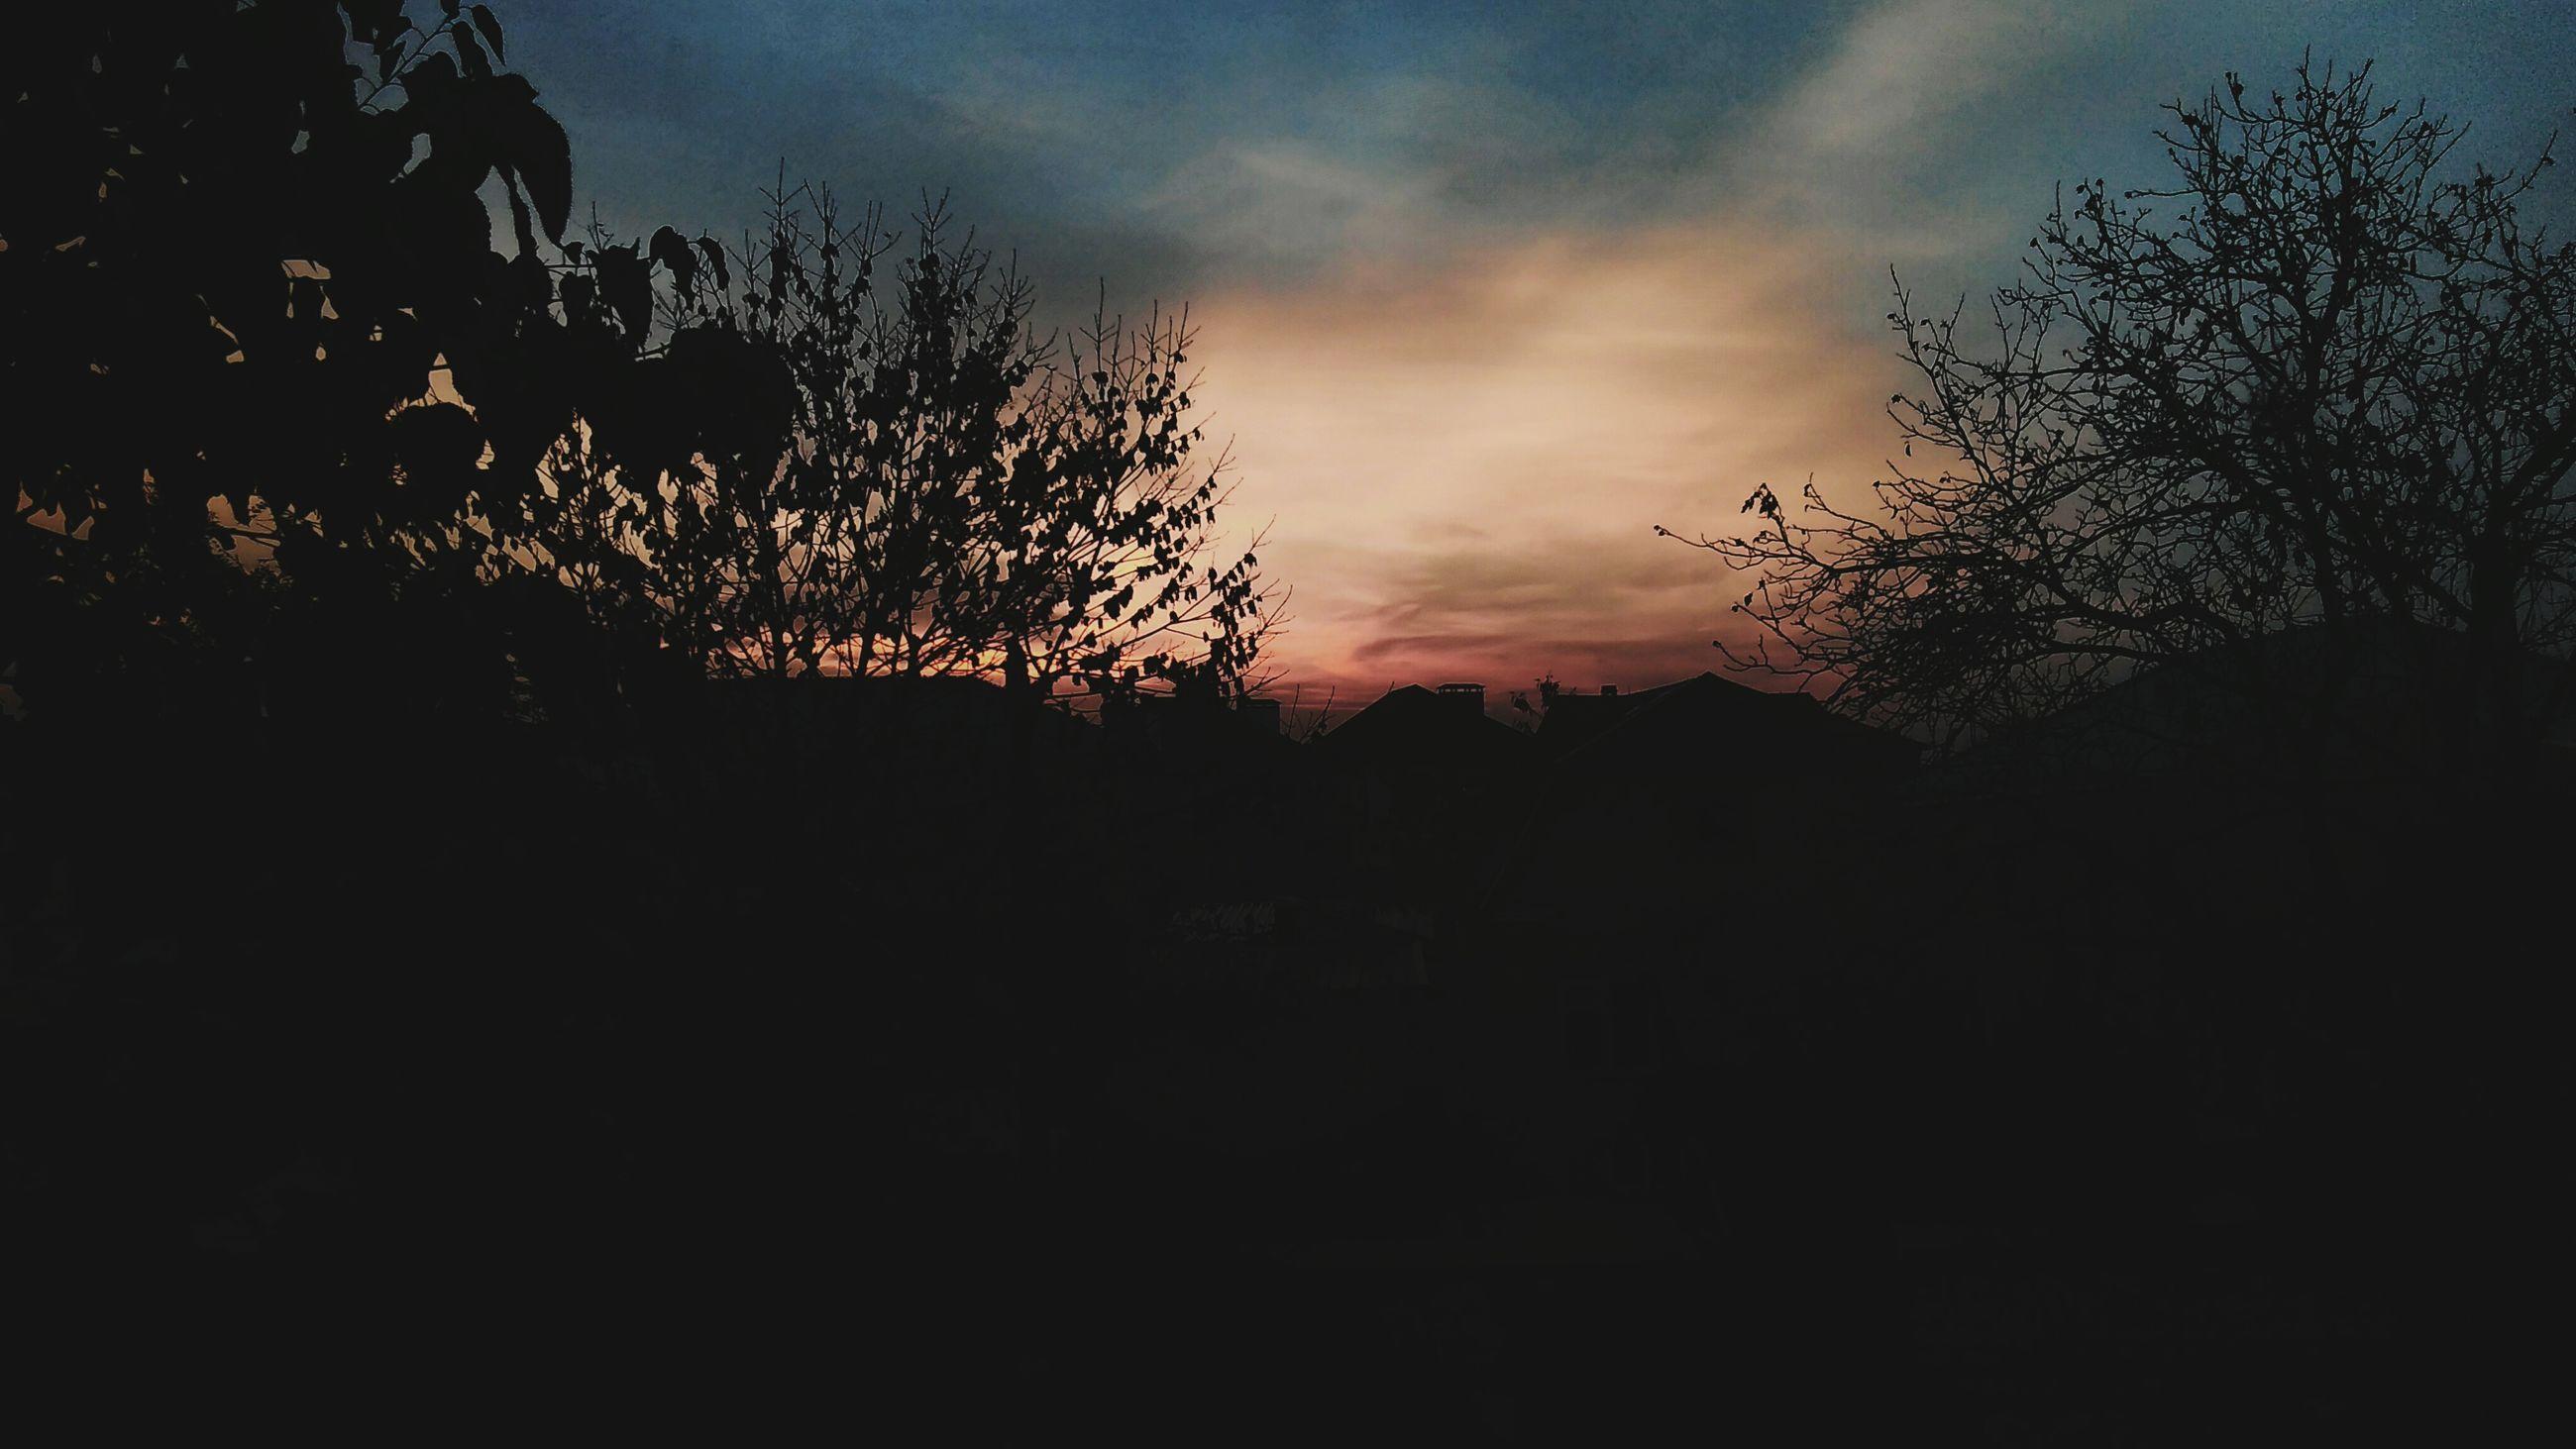 silhouette, sunset, sky, tree, tranquility, tranquil scene, scenics, beauty in nature, nature, cloud - sky, dark, landscape, idyllic, dusk, cloud, outline, orange color, outdoors, non-urban scene, no people